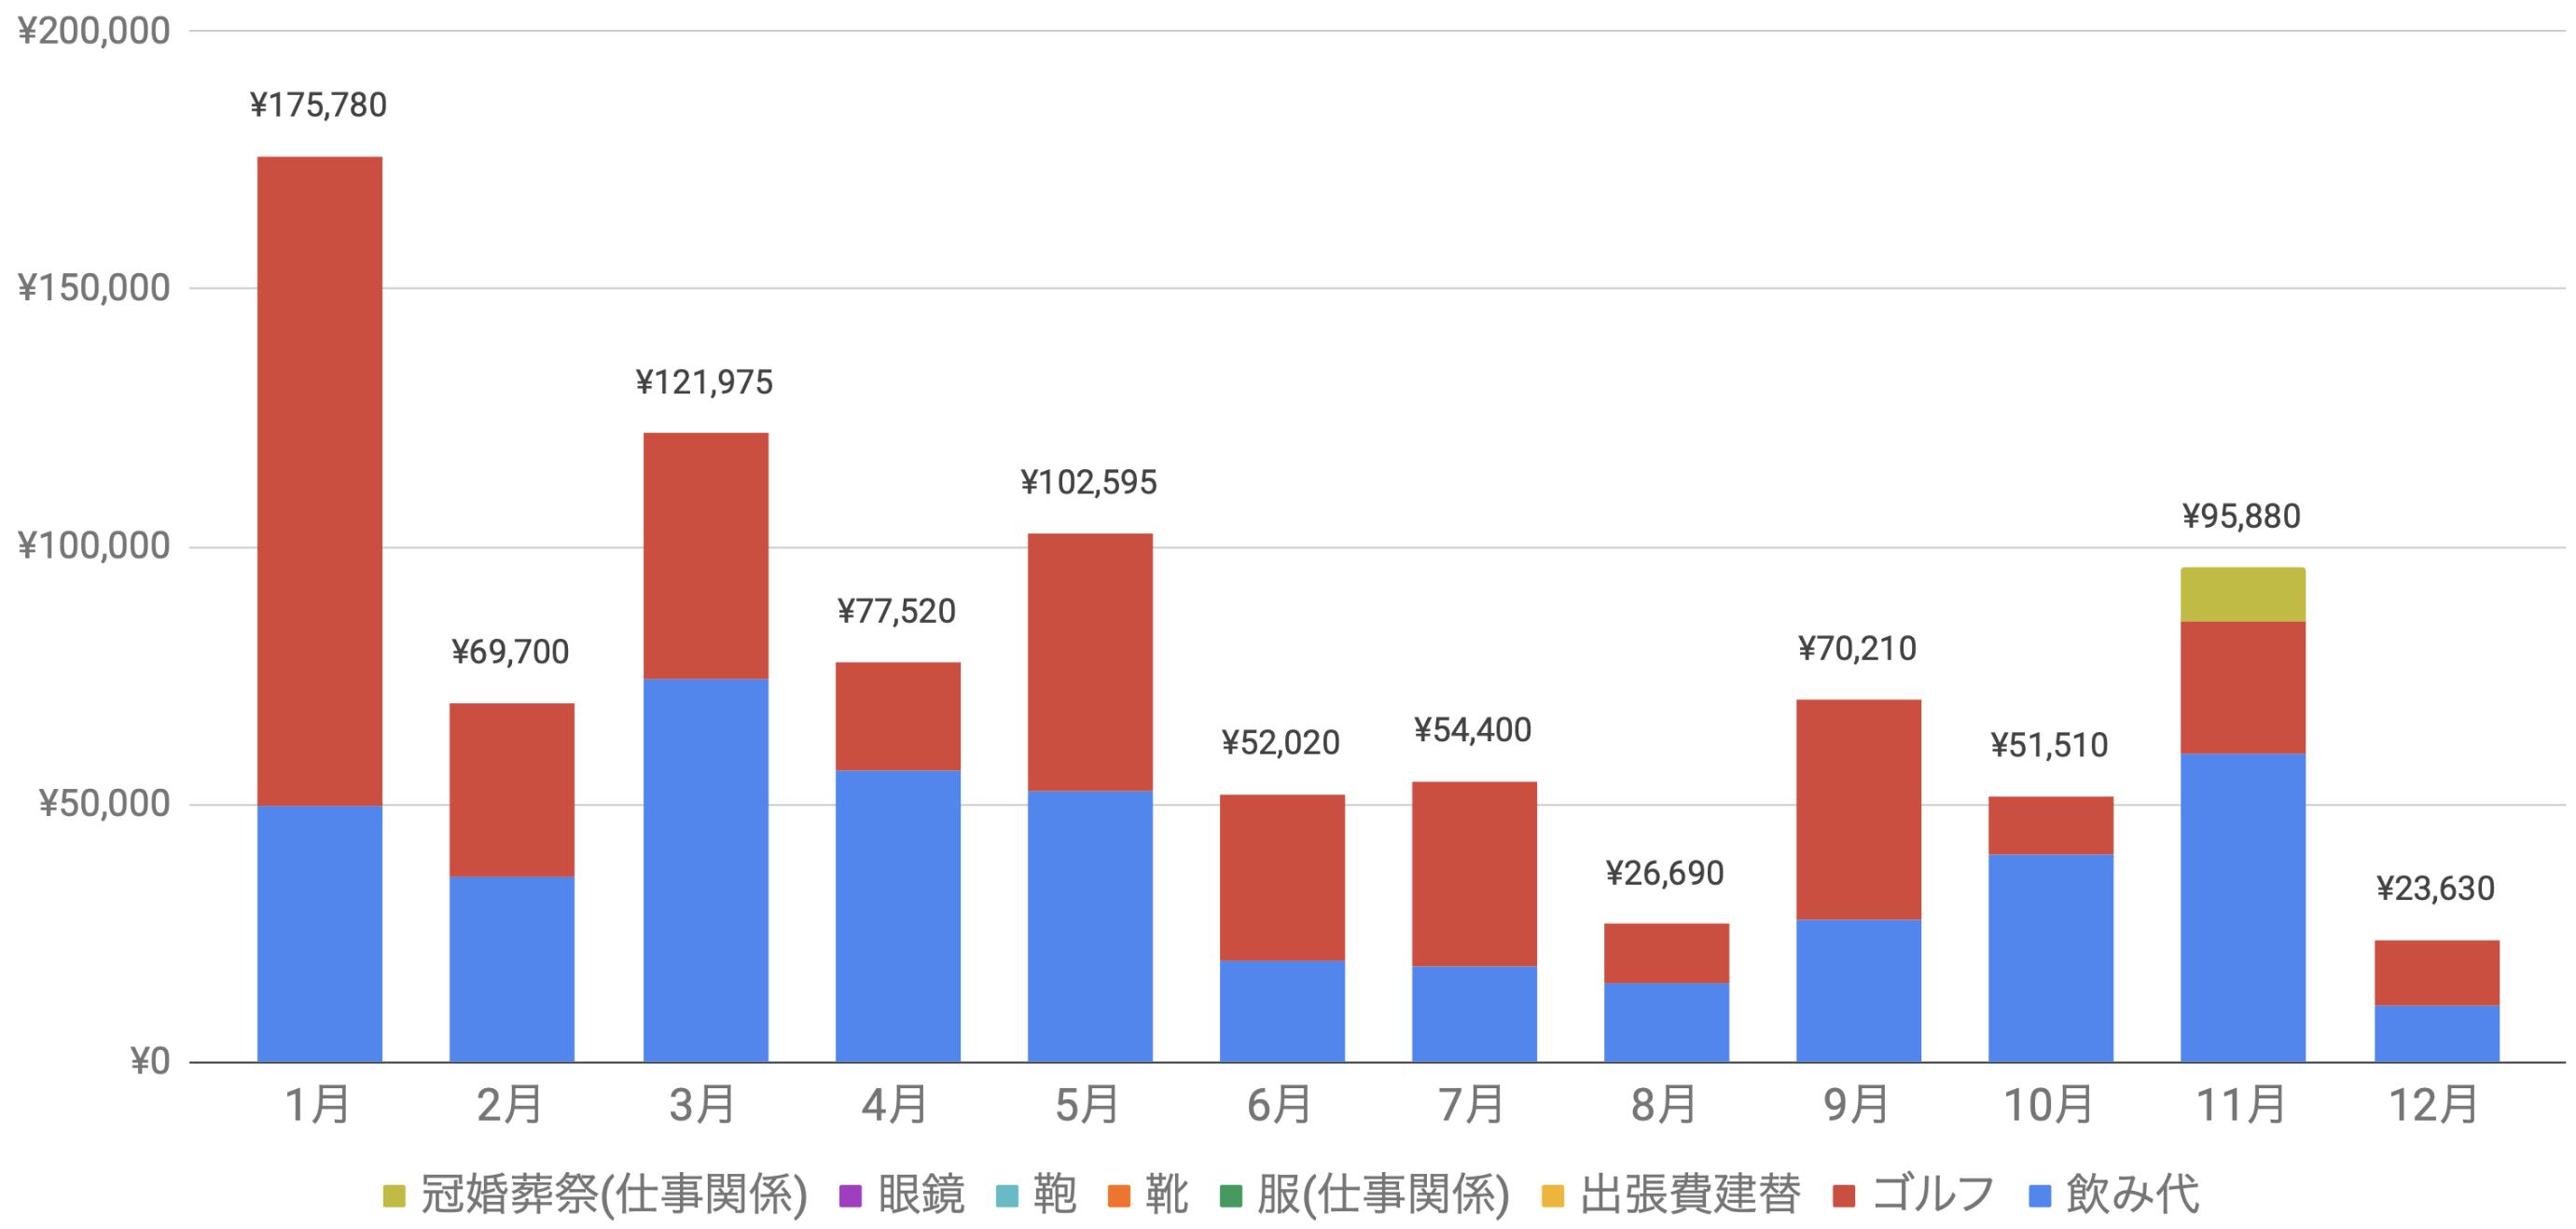 支出実績2019_12月_仕事関係費グラフ